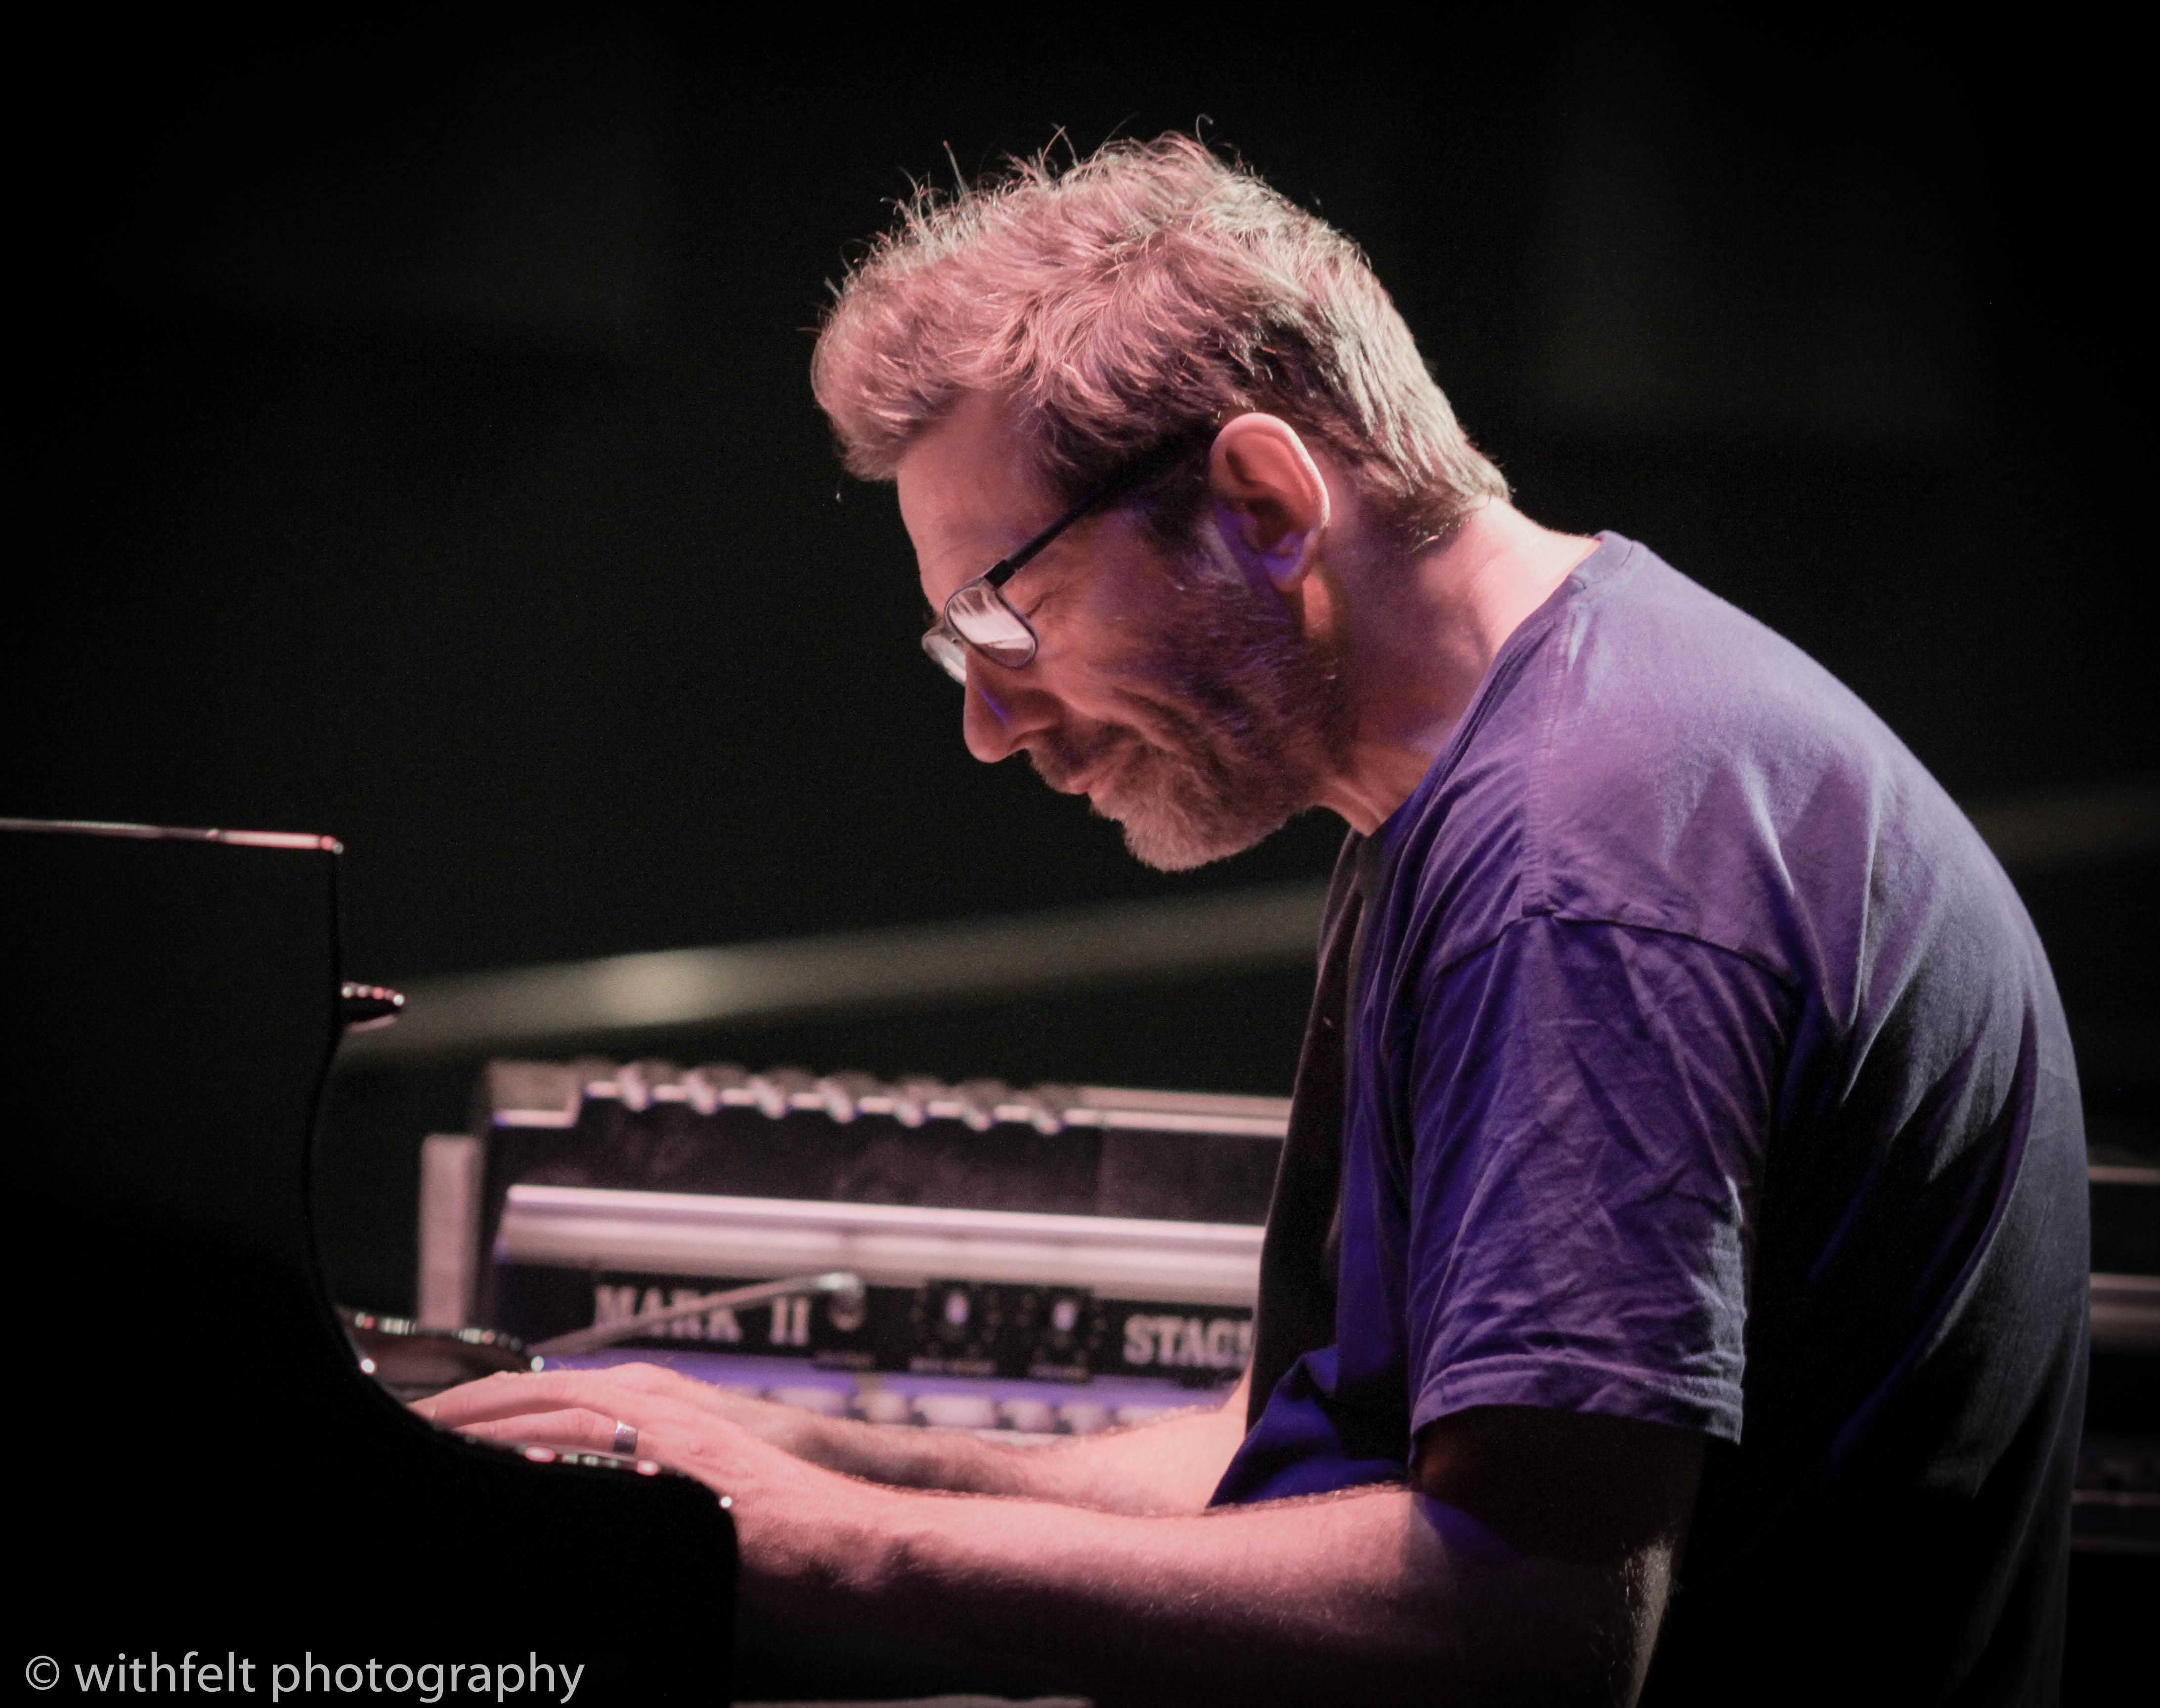 "Carsten Dahl: ""The Solo Songs of Keith Jarrett"" at Copenhagen Jazz Festival 2019 10.07.2019 Linn up: Carsten Dahl (pia) Palle Mikkelborg (tp) Frederik Lundin (tenor sax) Nils Bo Davidsen (bass) Stefan Pasborg (dr.) Sana Ripatti (viola) Ana Feitdsa (violin"